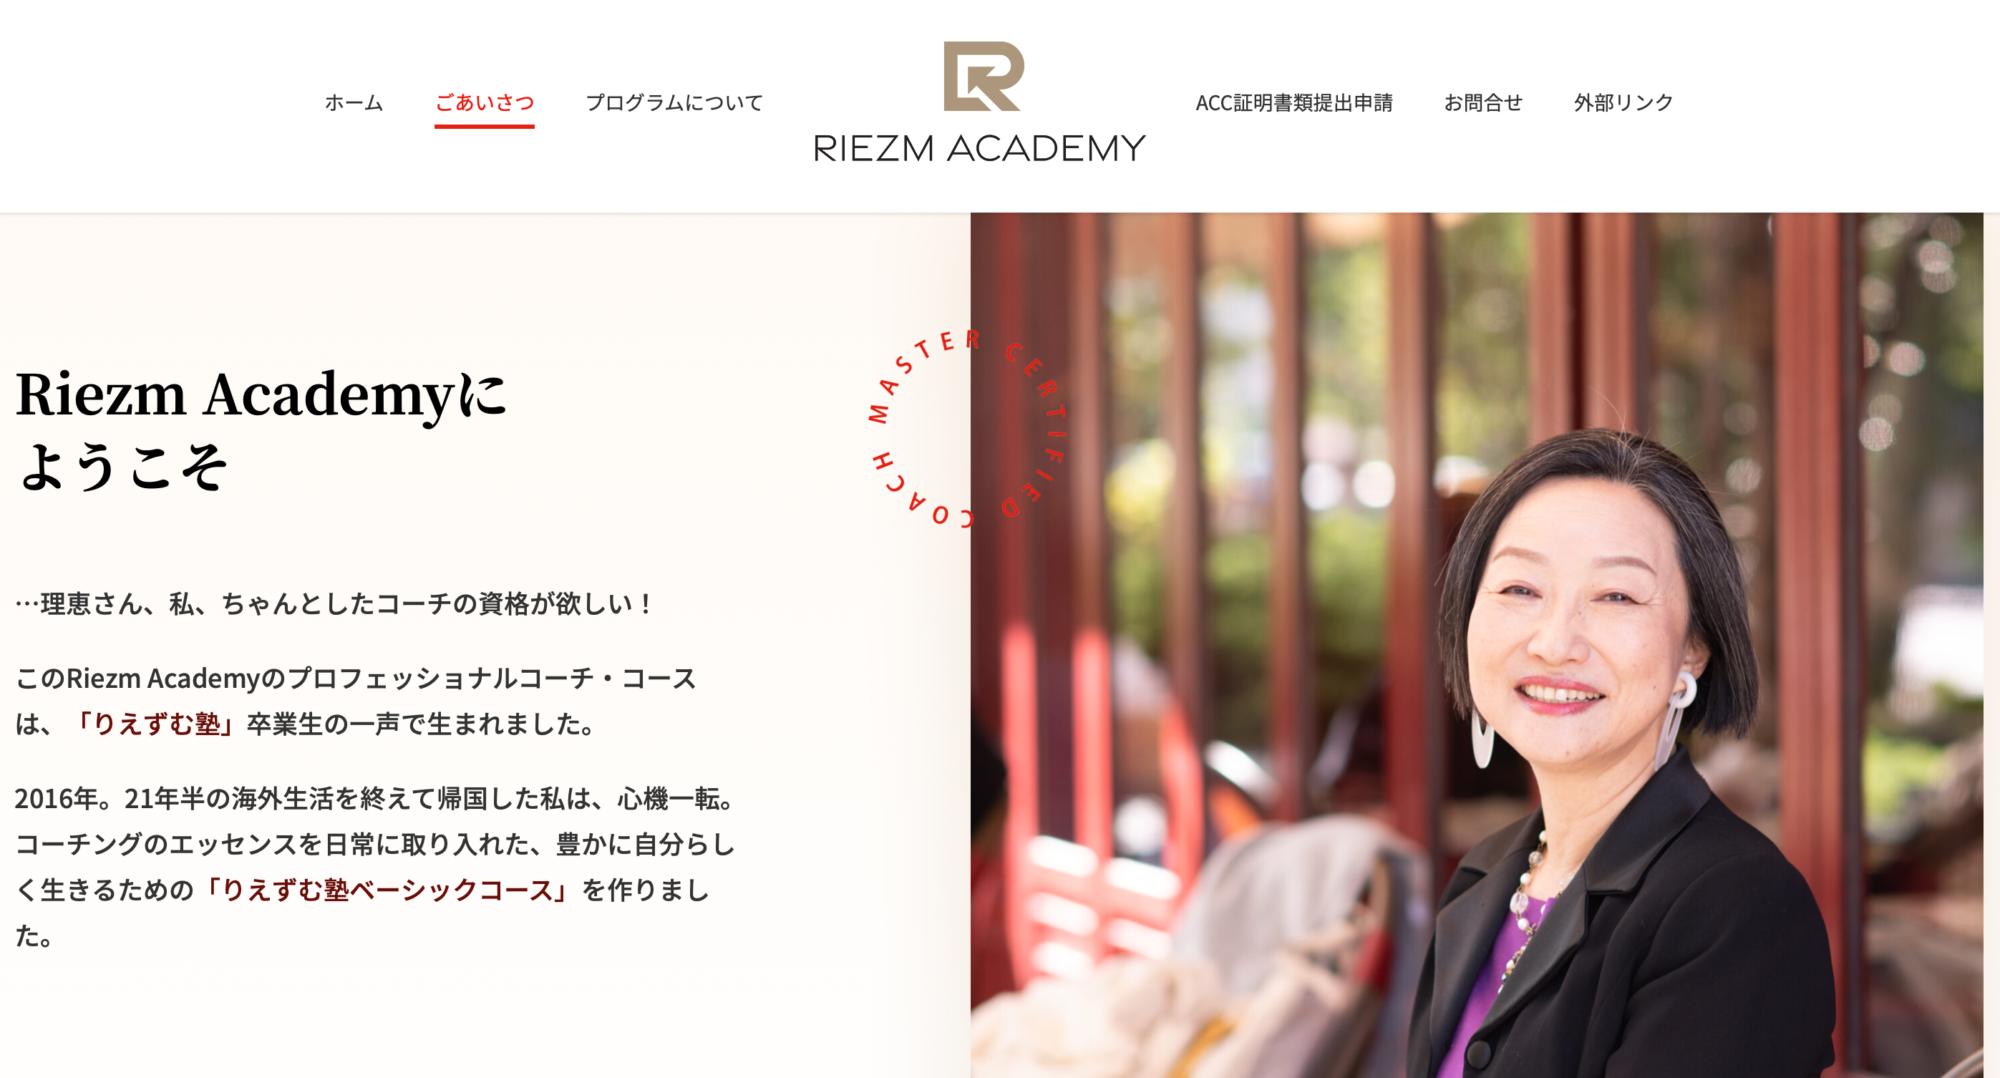 RIEZM Academy 本日立ち上げました